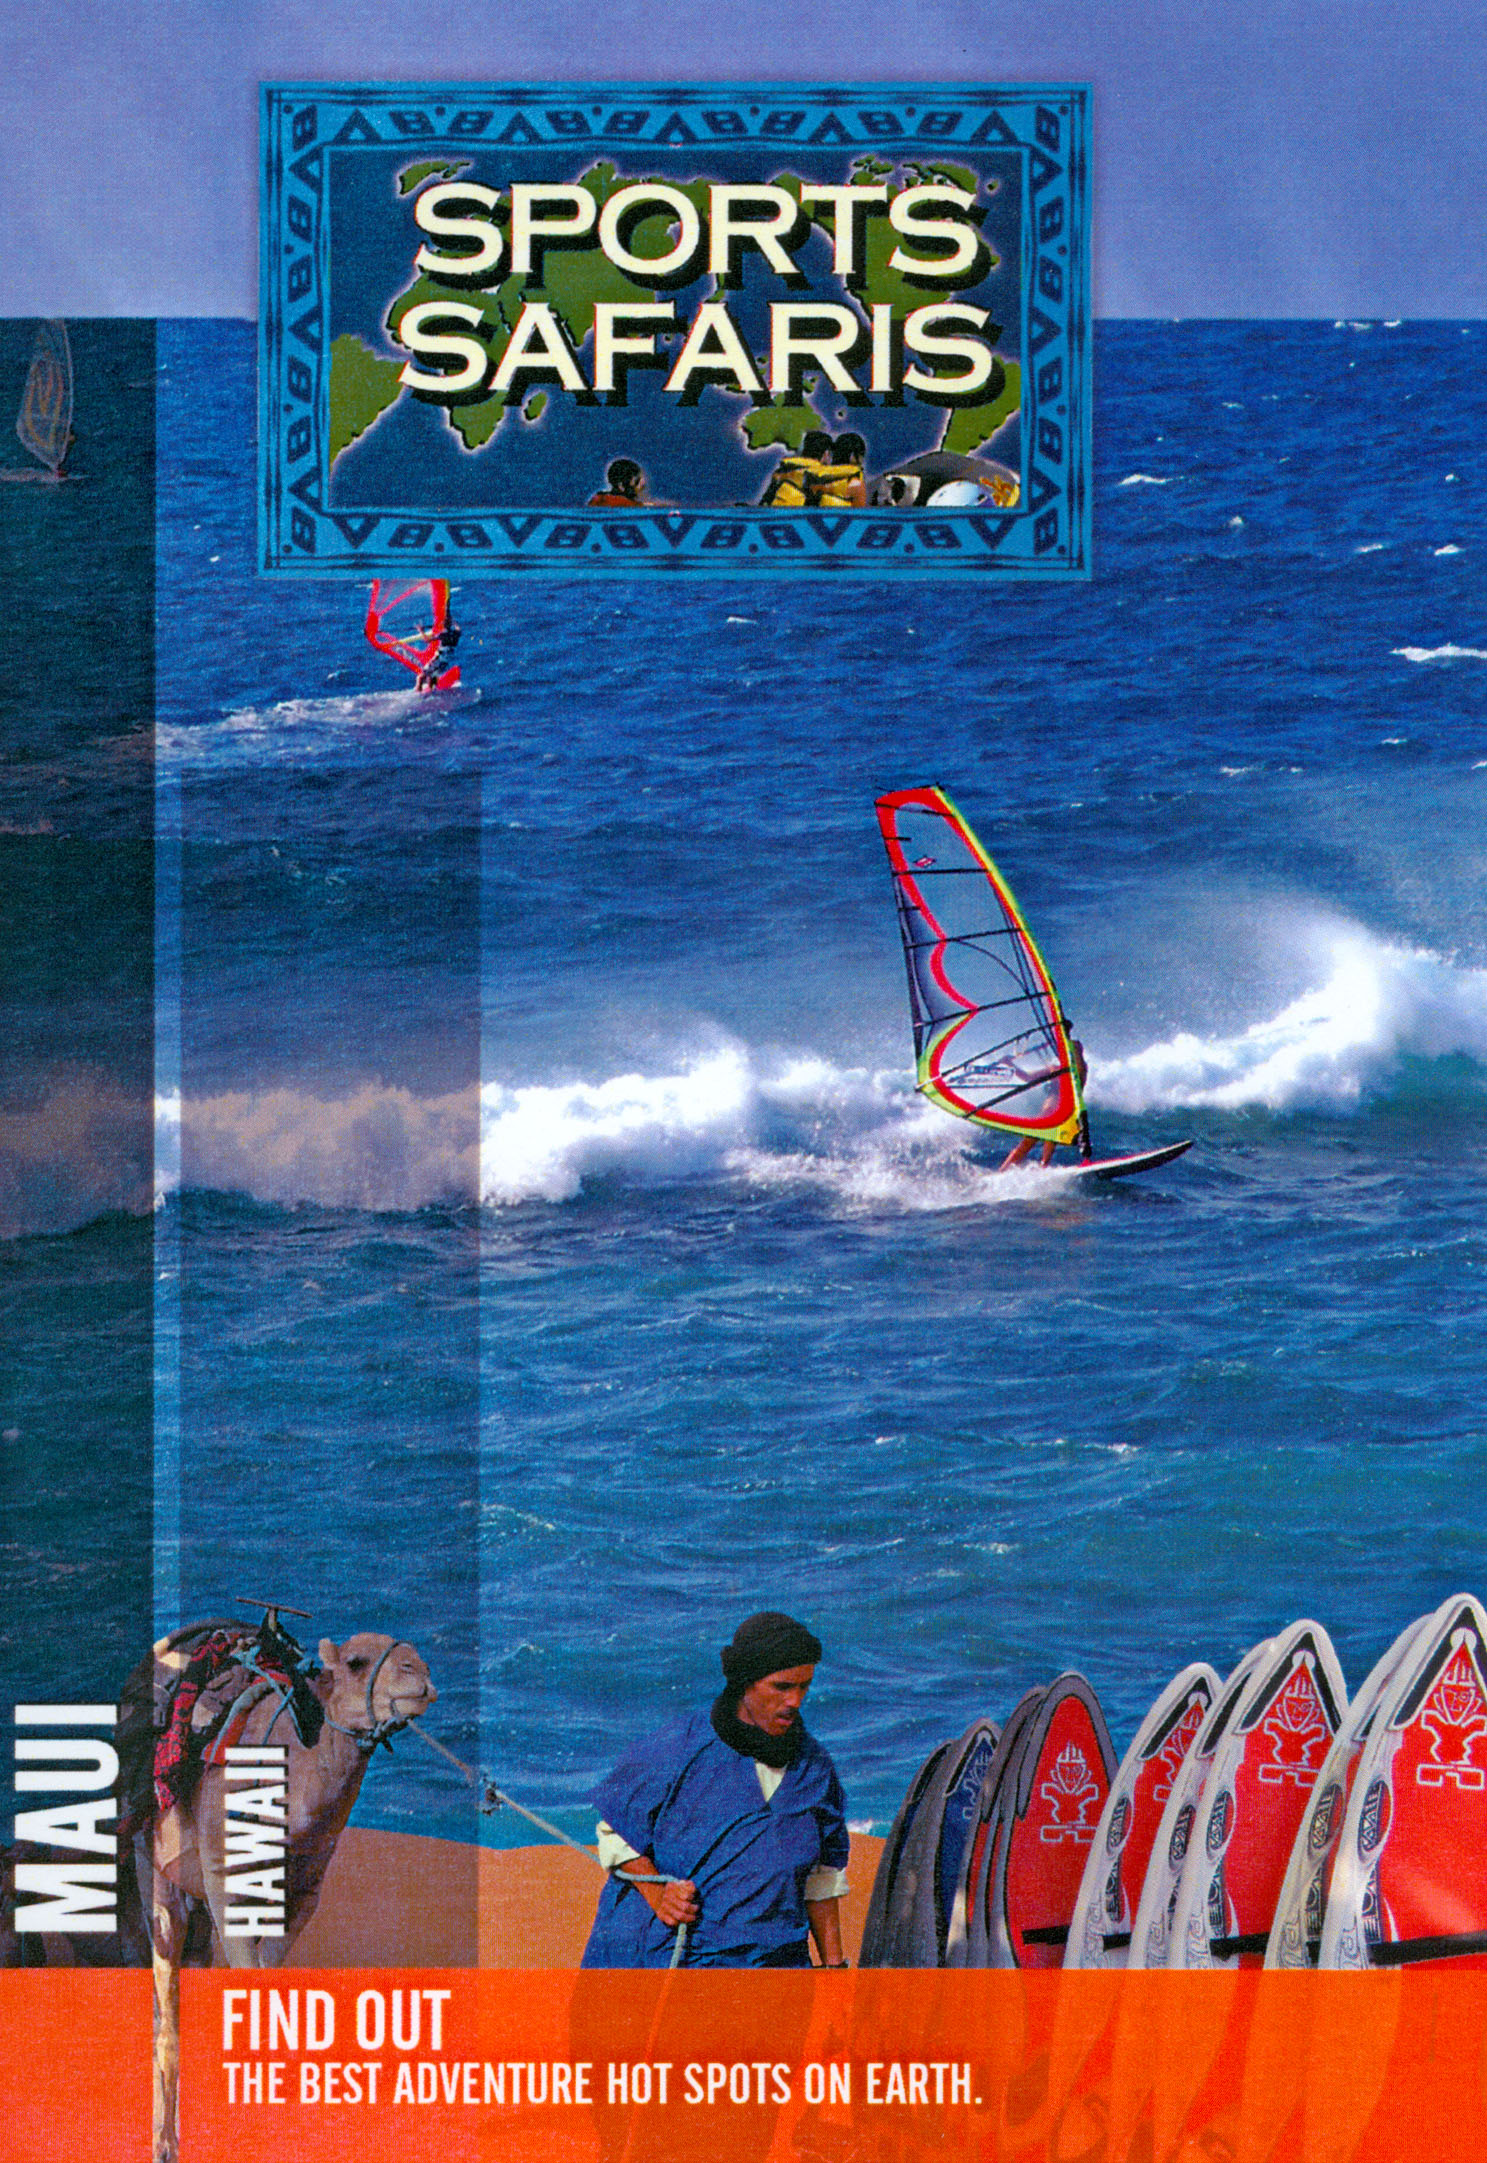 Sports Safaris: Maui Hawaii